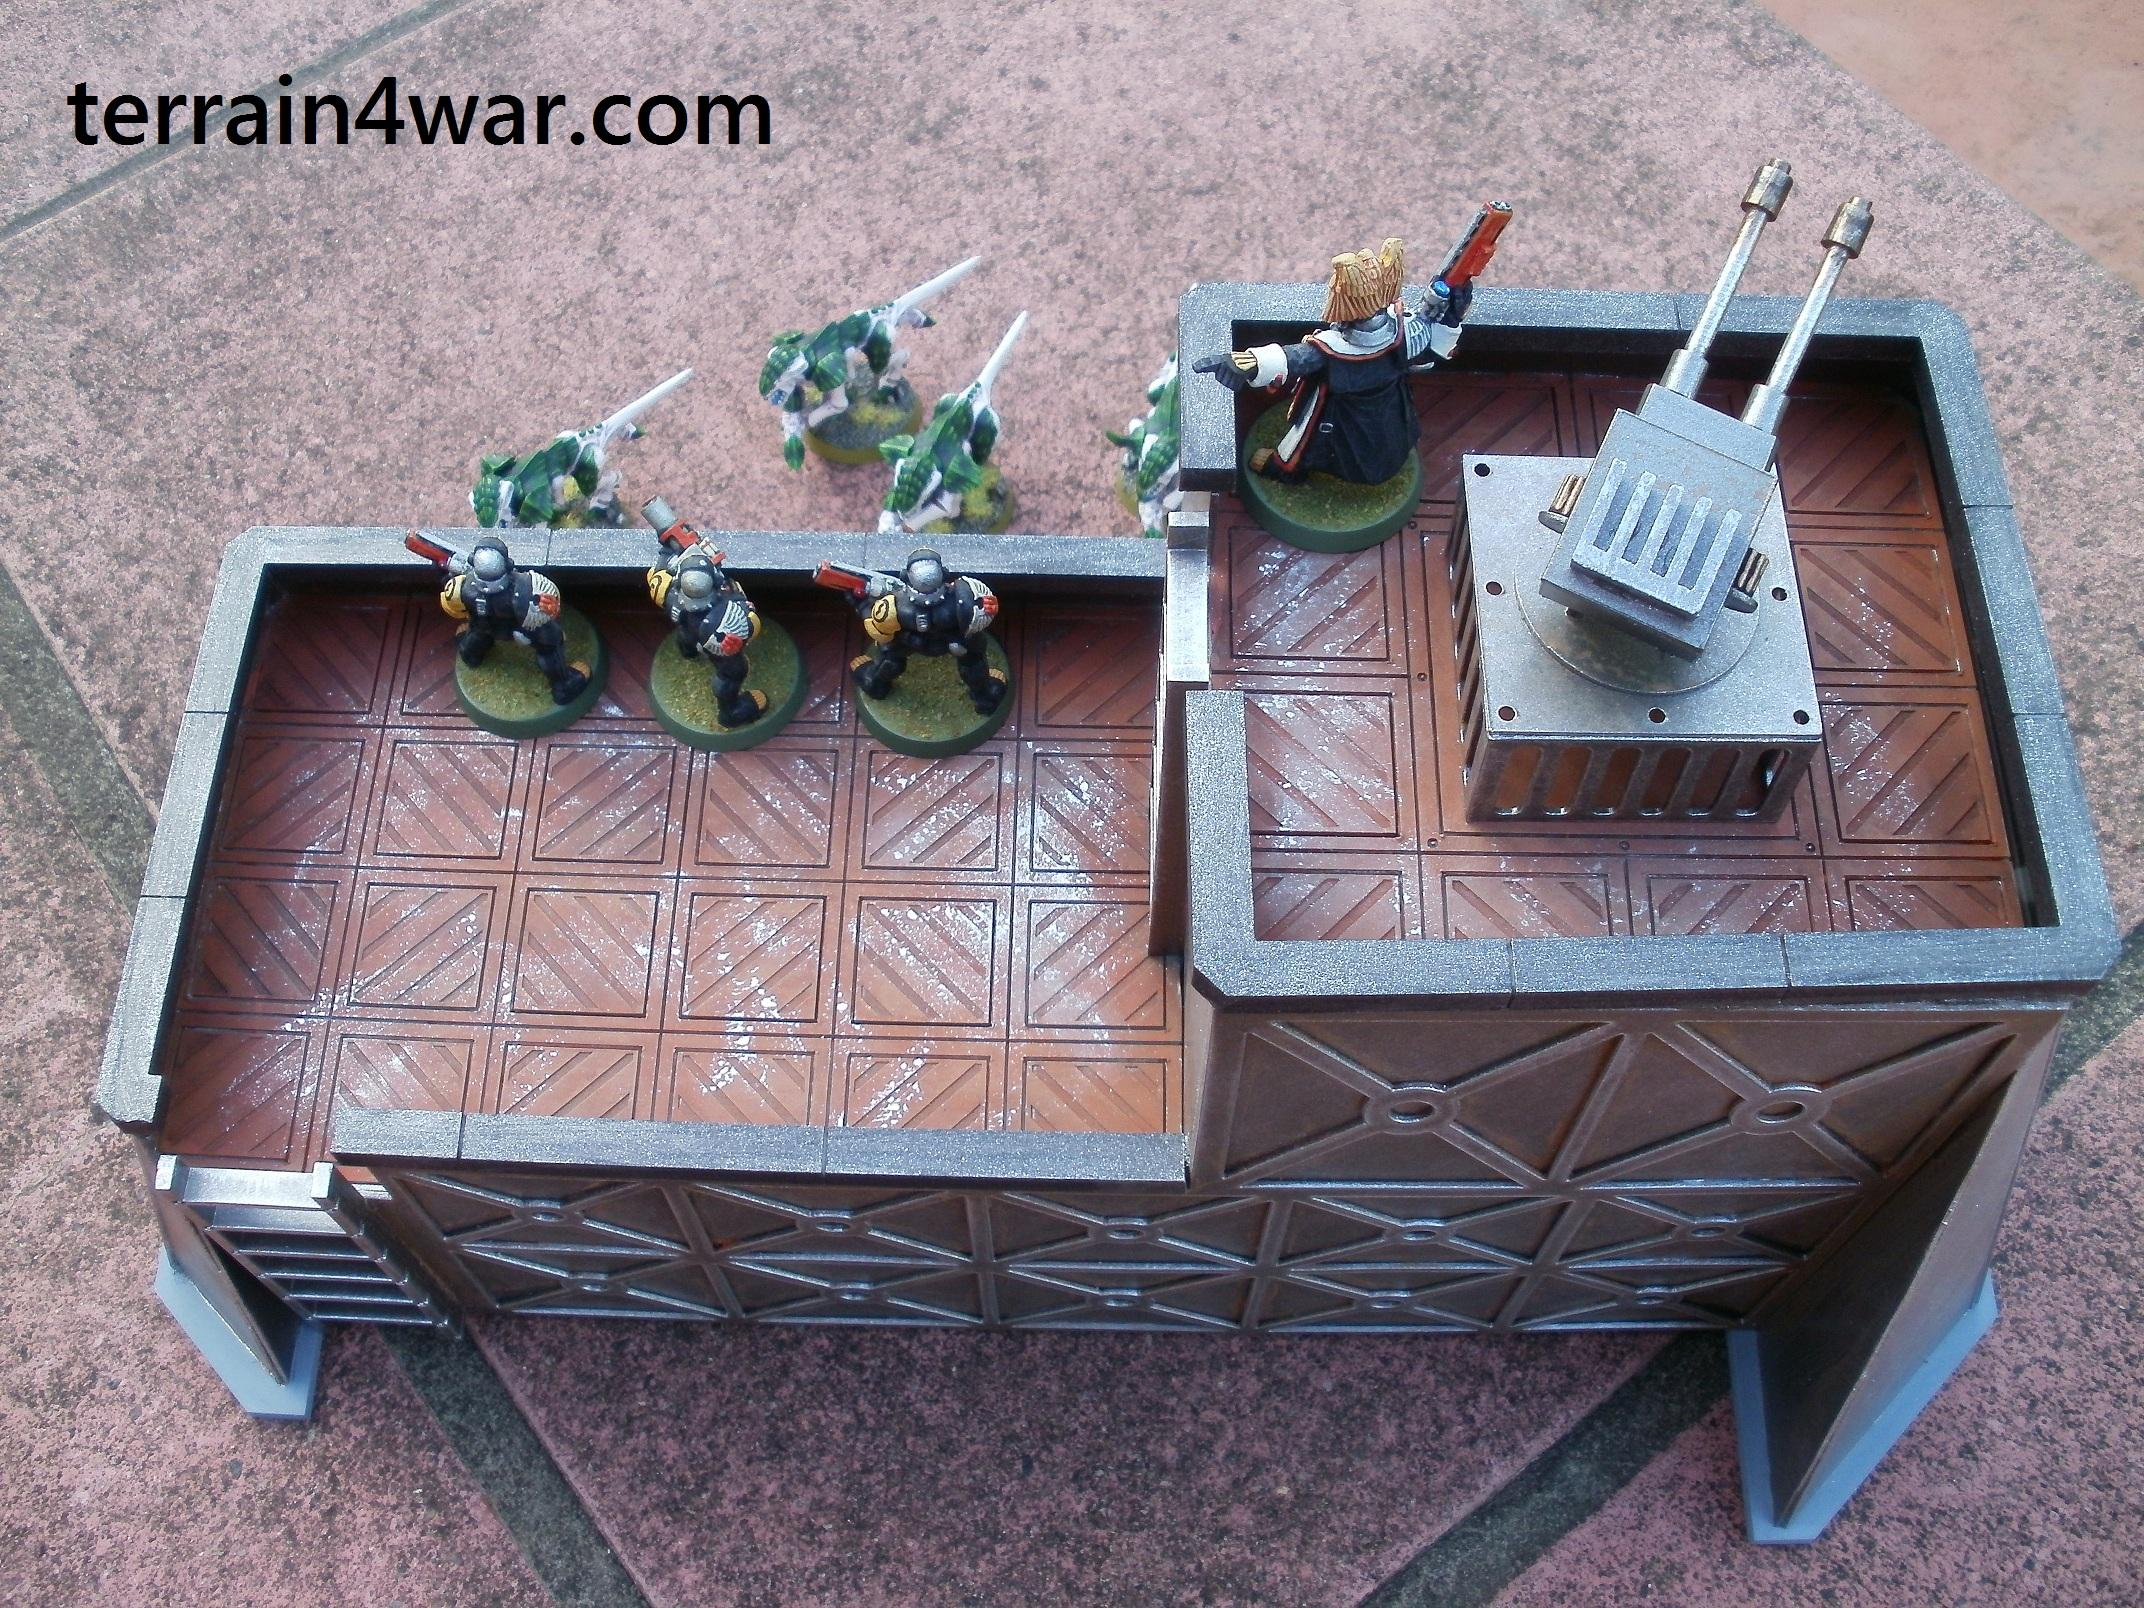 Buildings, Bunker, City, Stronghold, Terrain, Terrain4war, Warhammer 40,000